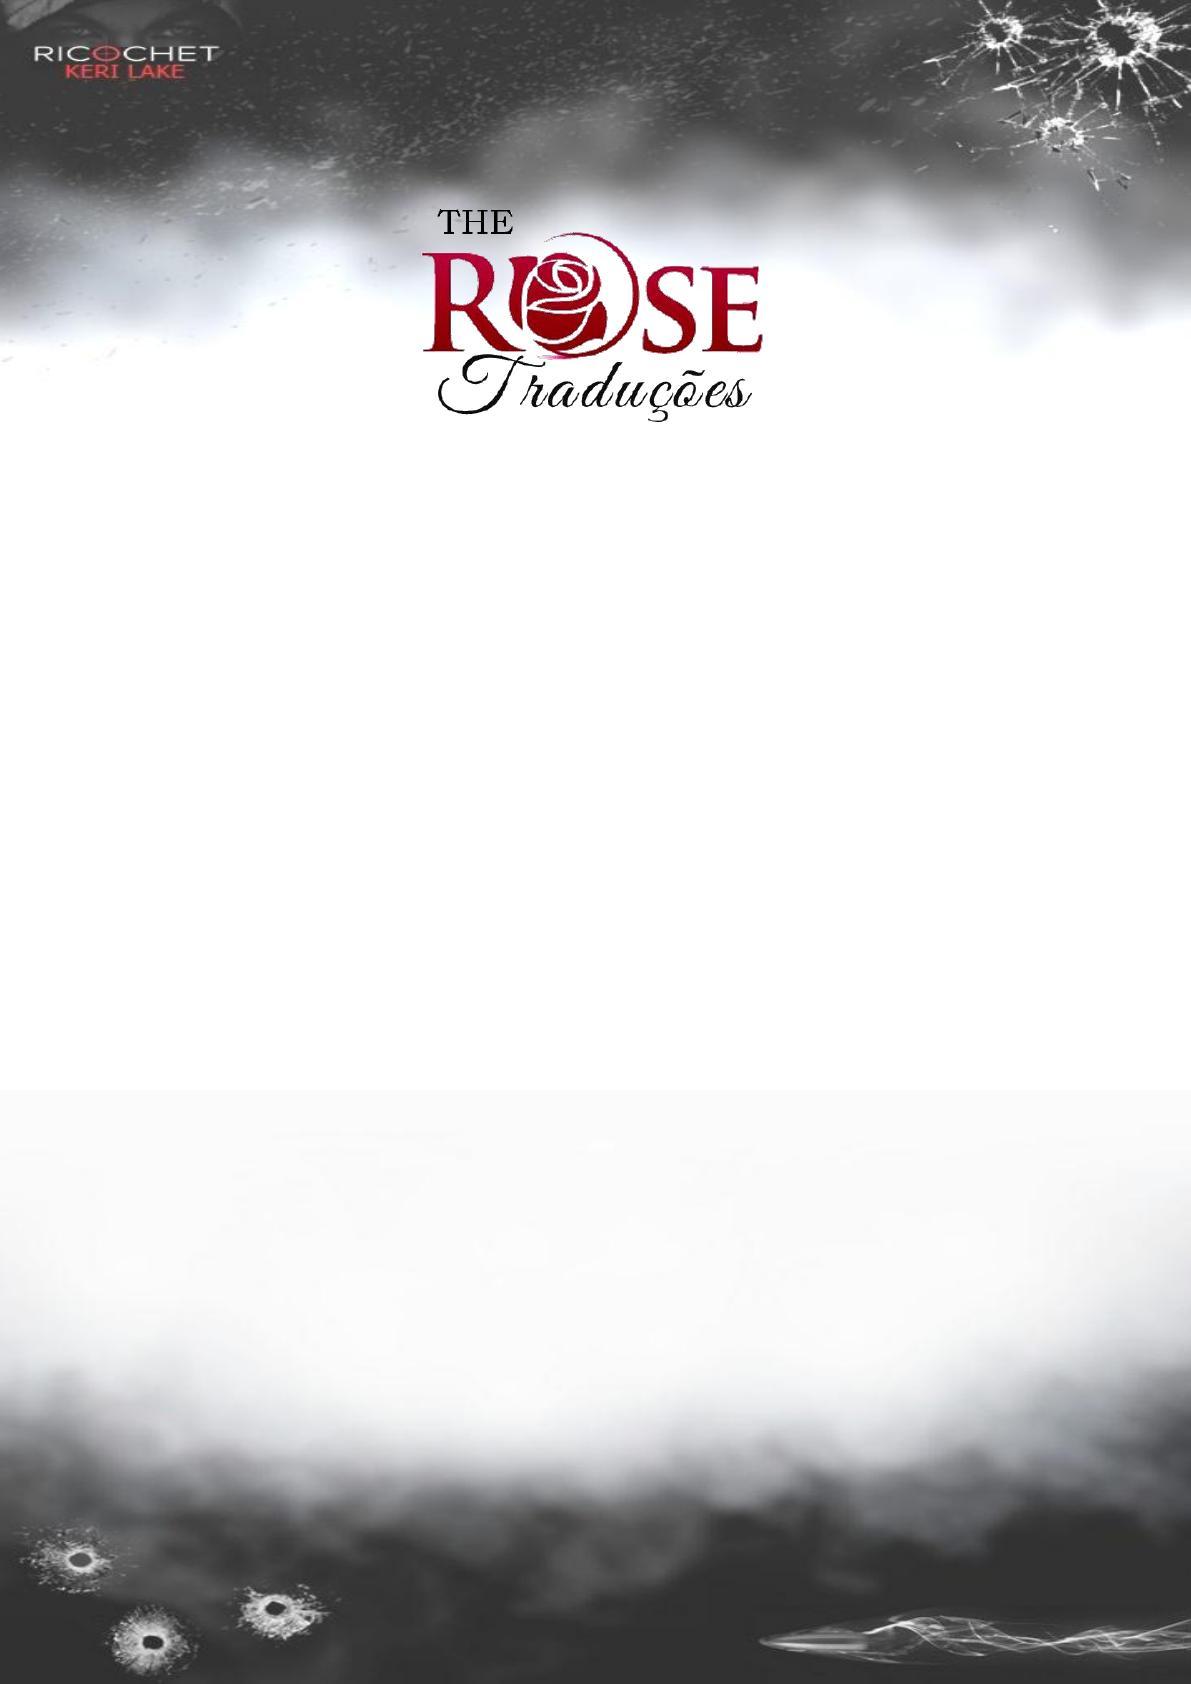 Rígido anúncios viúvas 16243